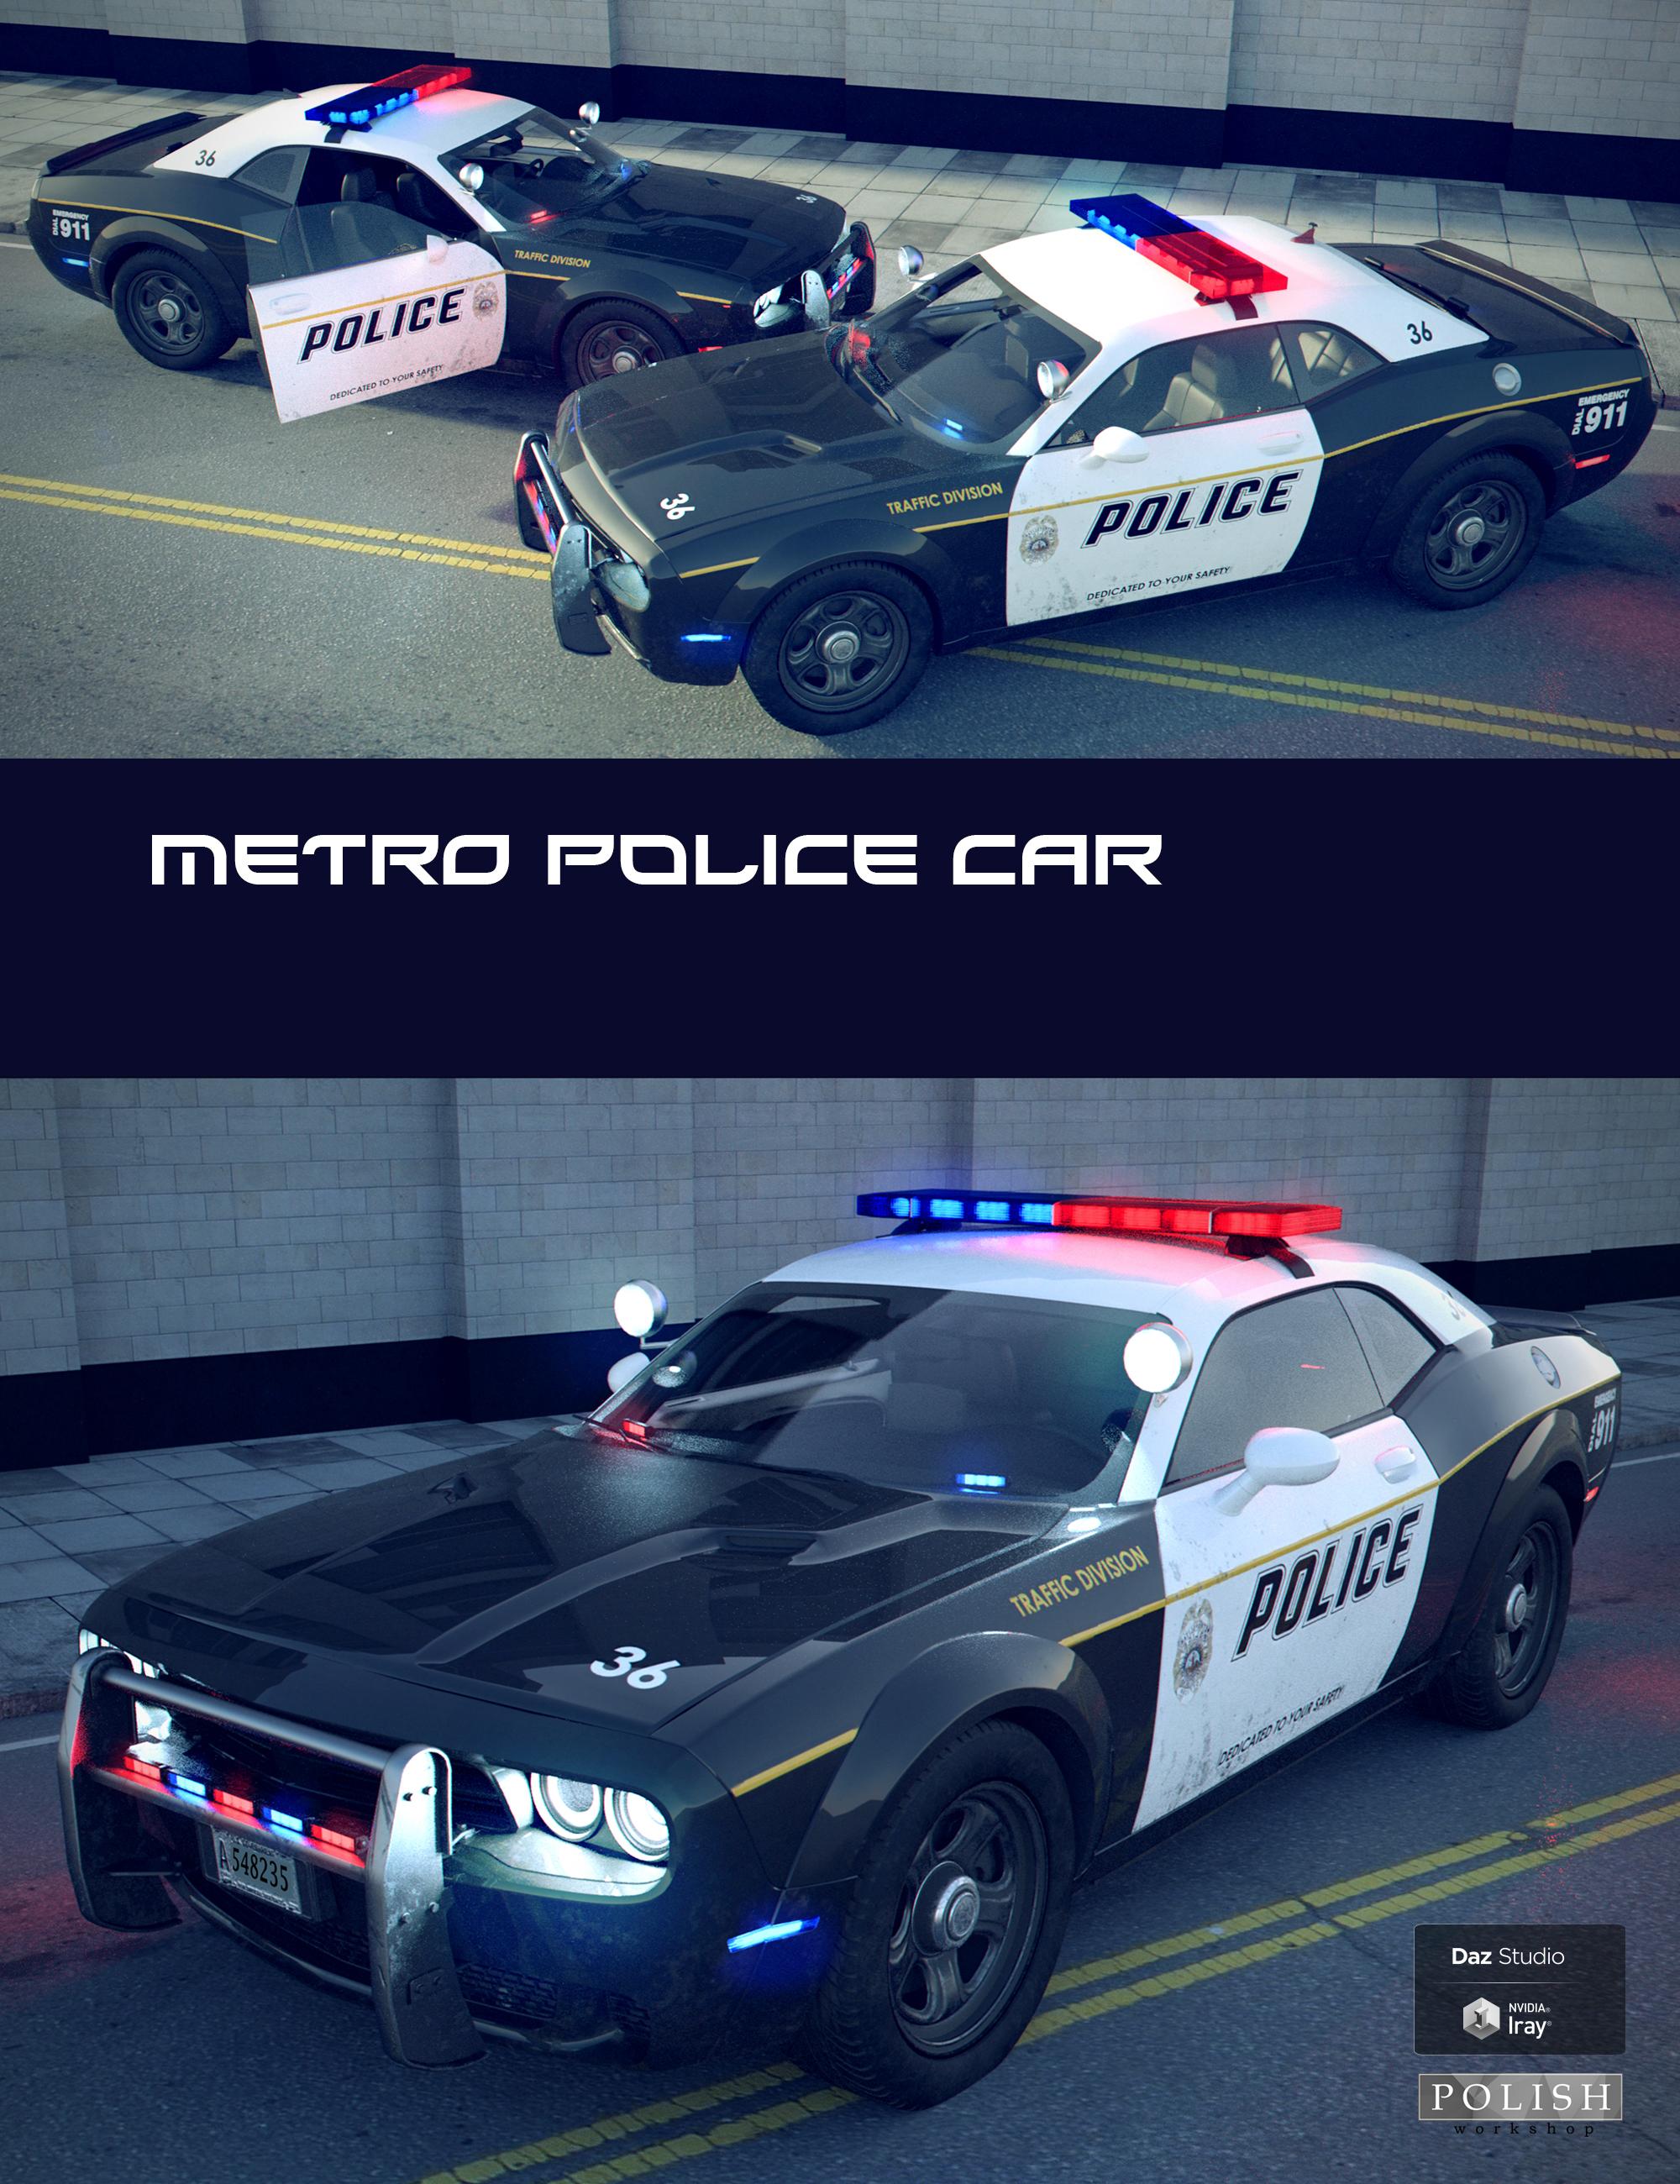 Metro Police Car by: Polish, 3D Models by Daz 3D